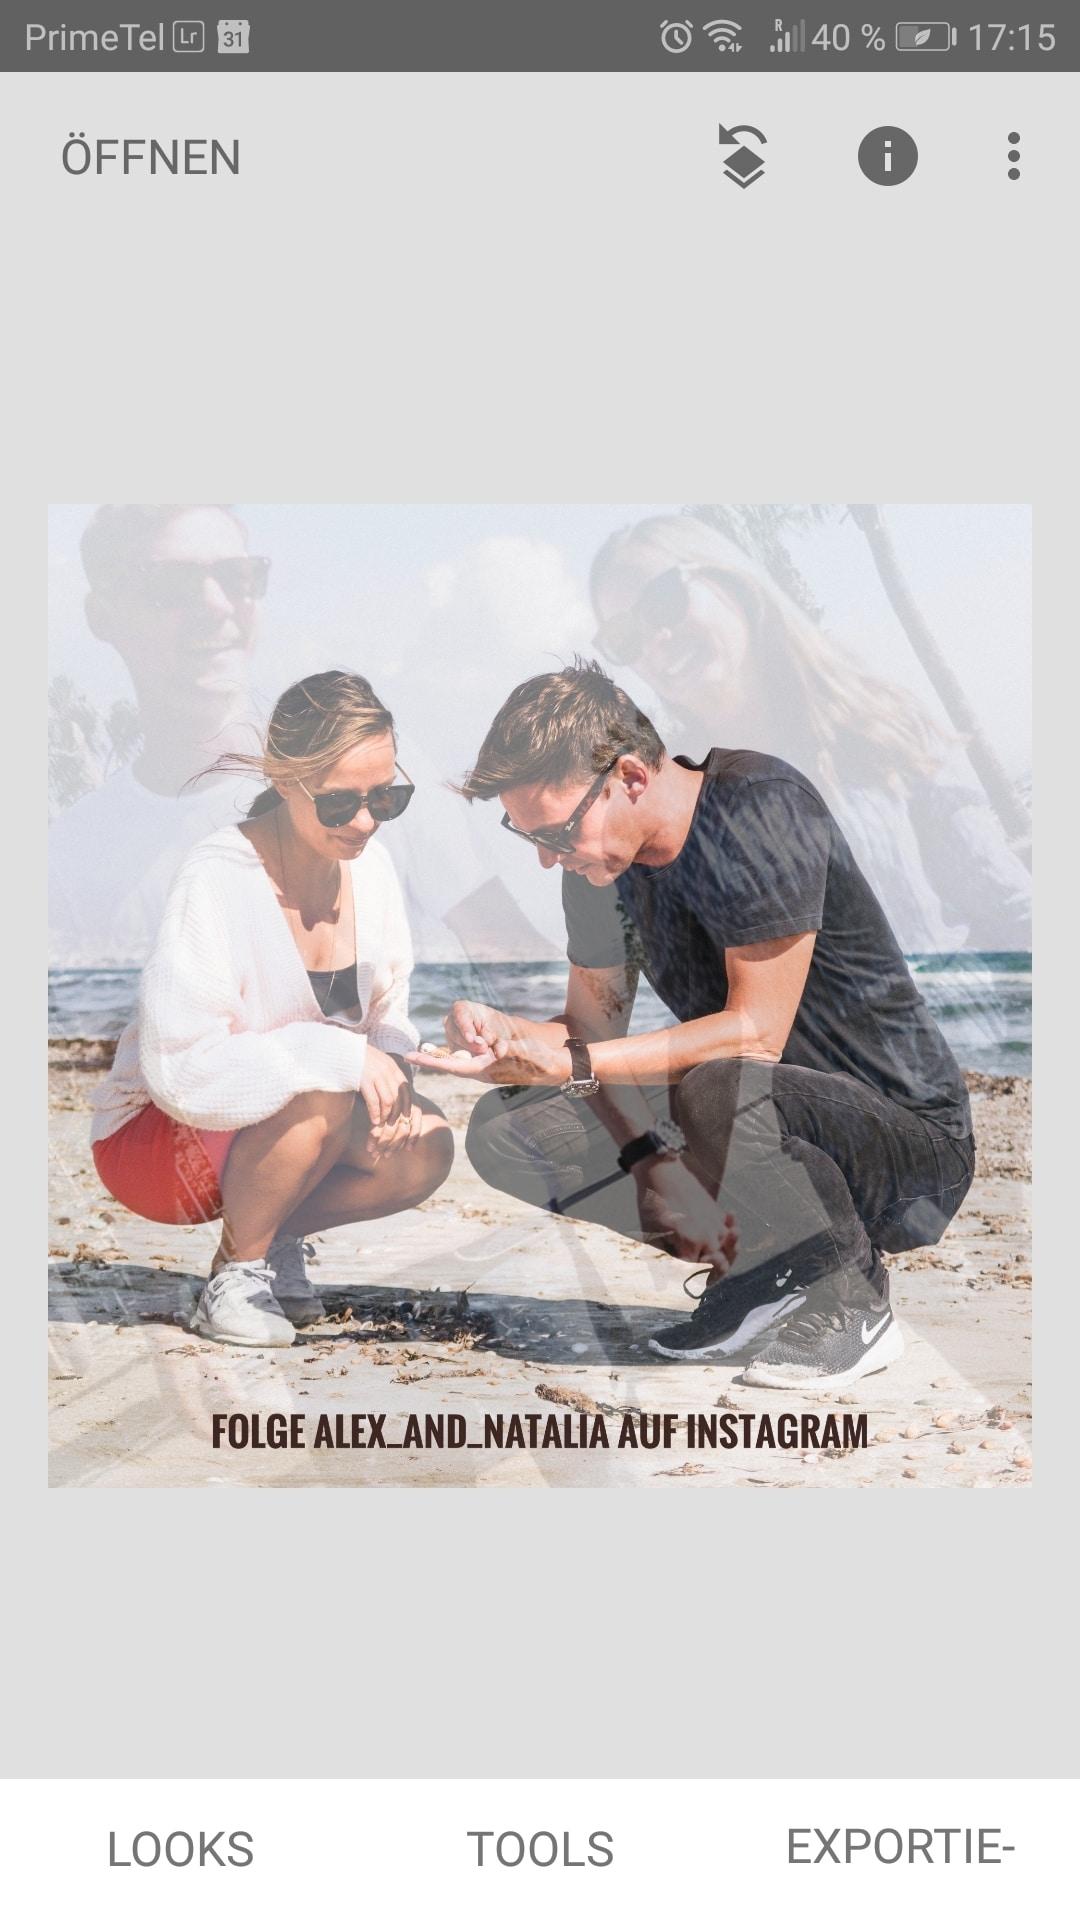 Perfekte Instagram Bilder bearbeiten. 1